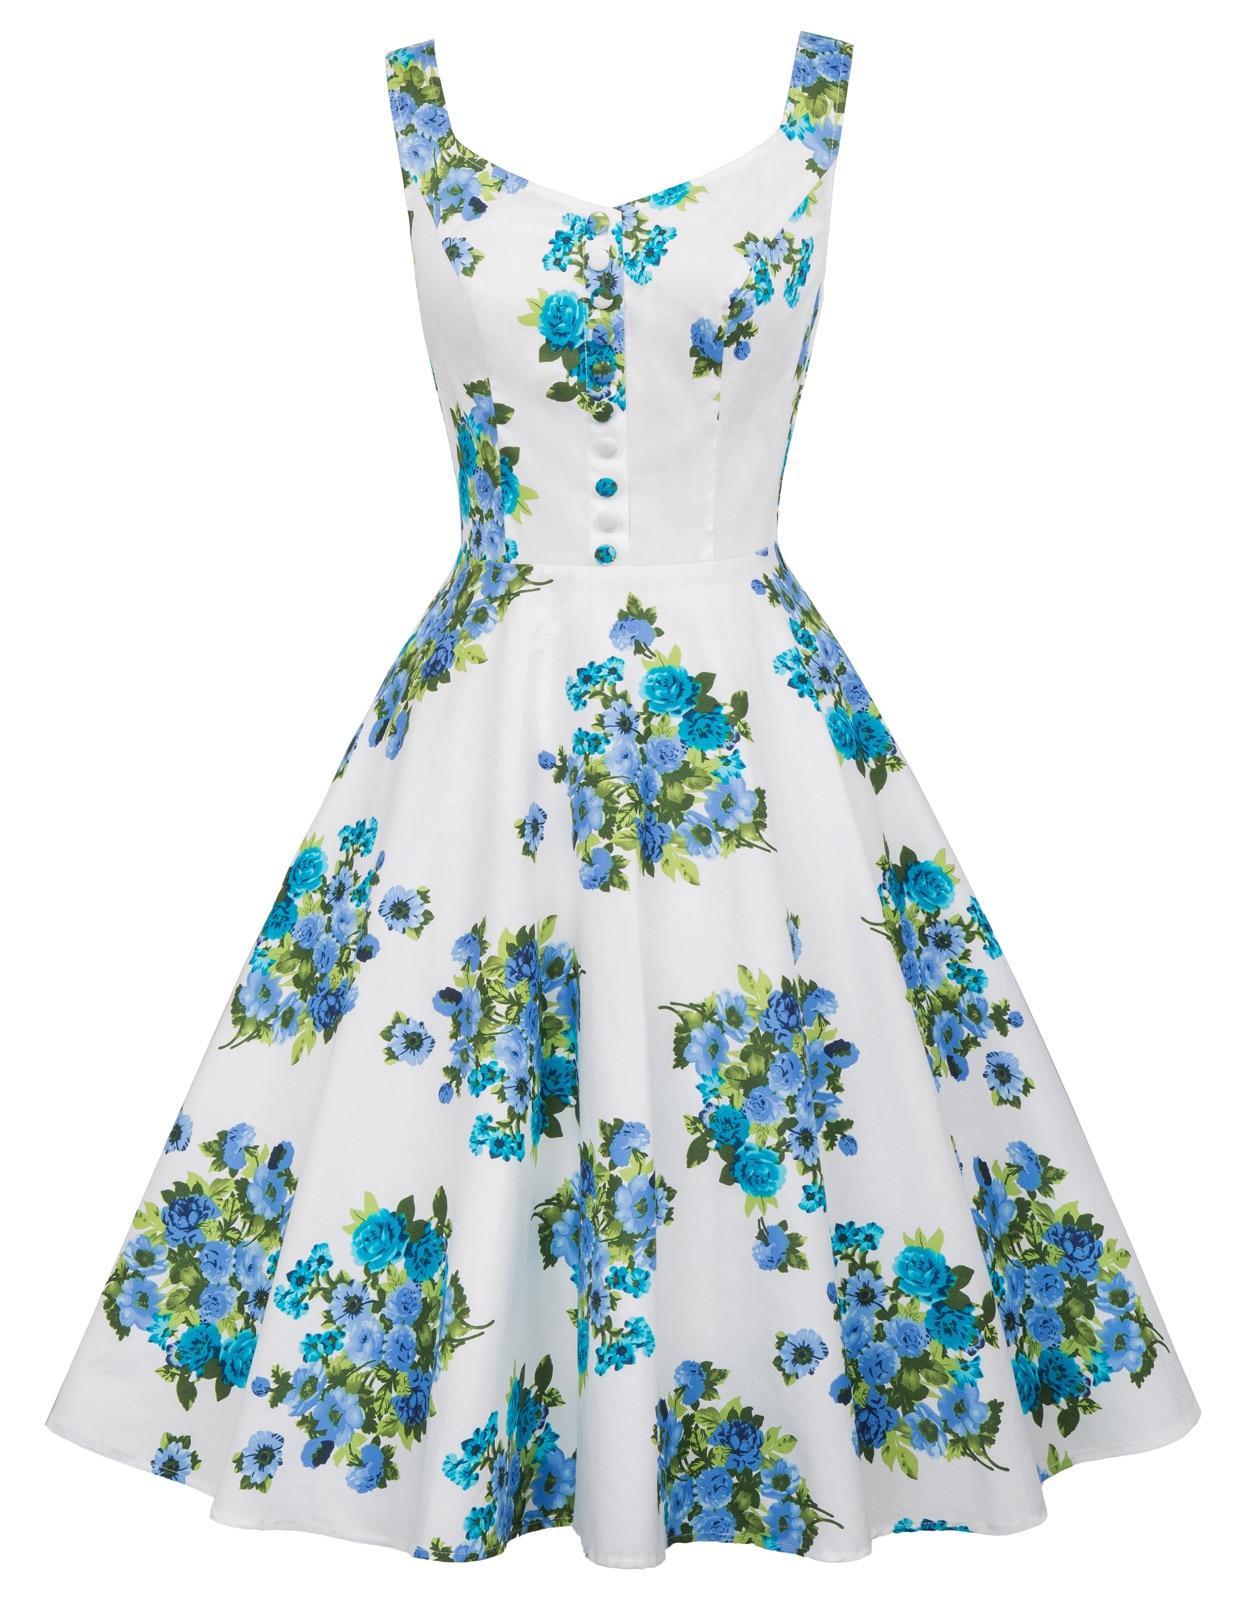 Retro Sleeveless V-Neck Polka Dots Splicing Flared A-Line Picnic Dress